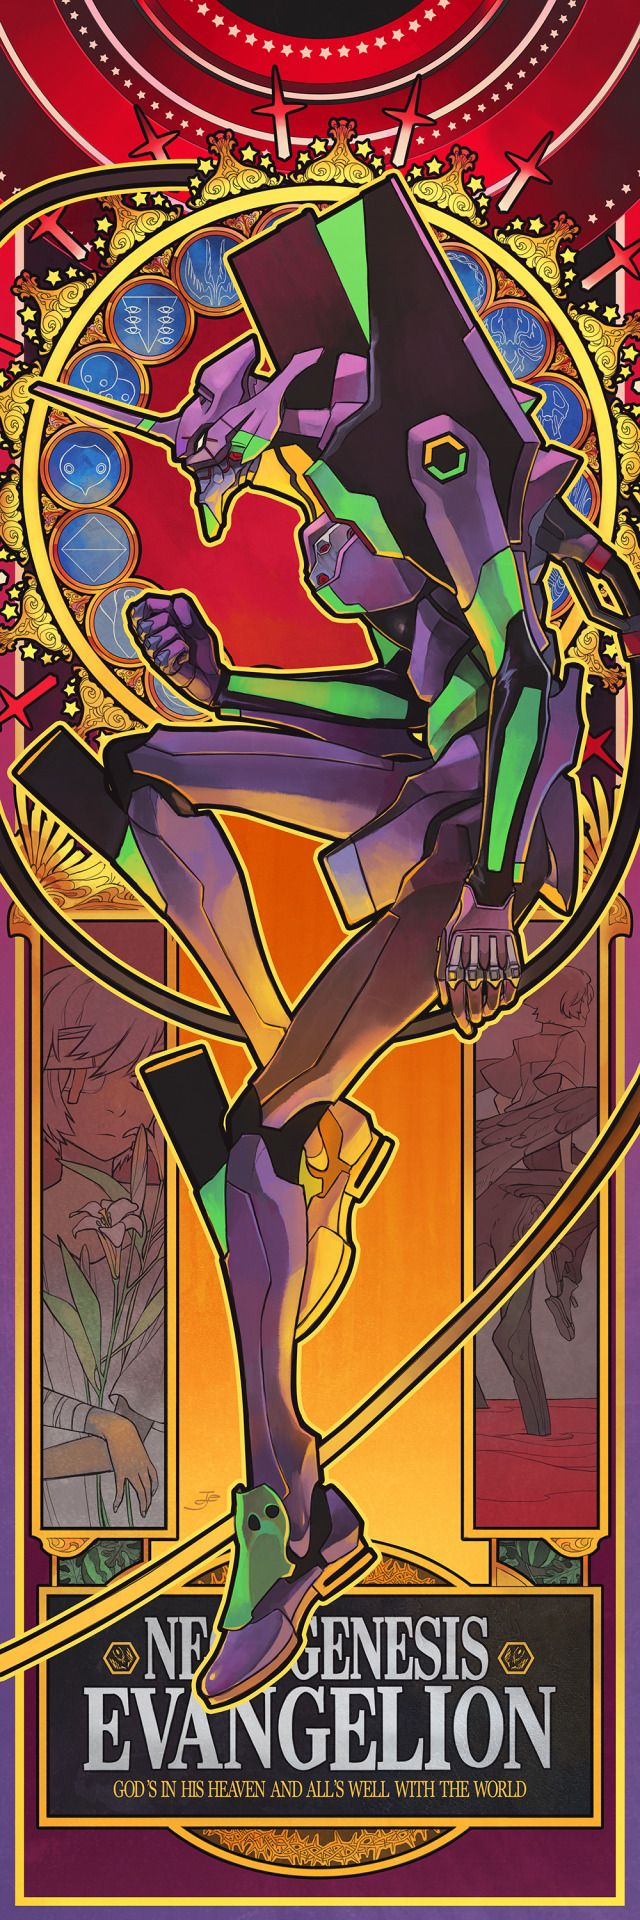 Neon Genesis Evangelion Aesthetic Wallpapers